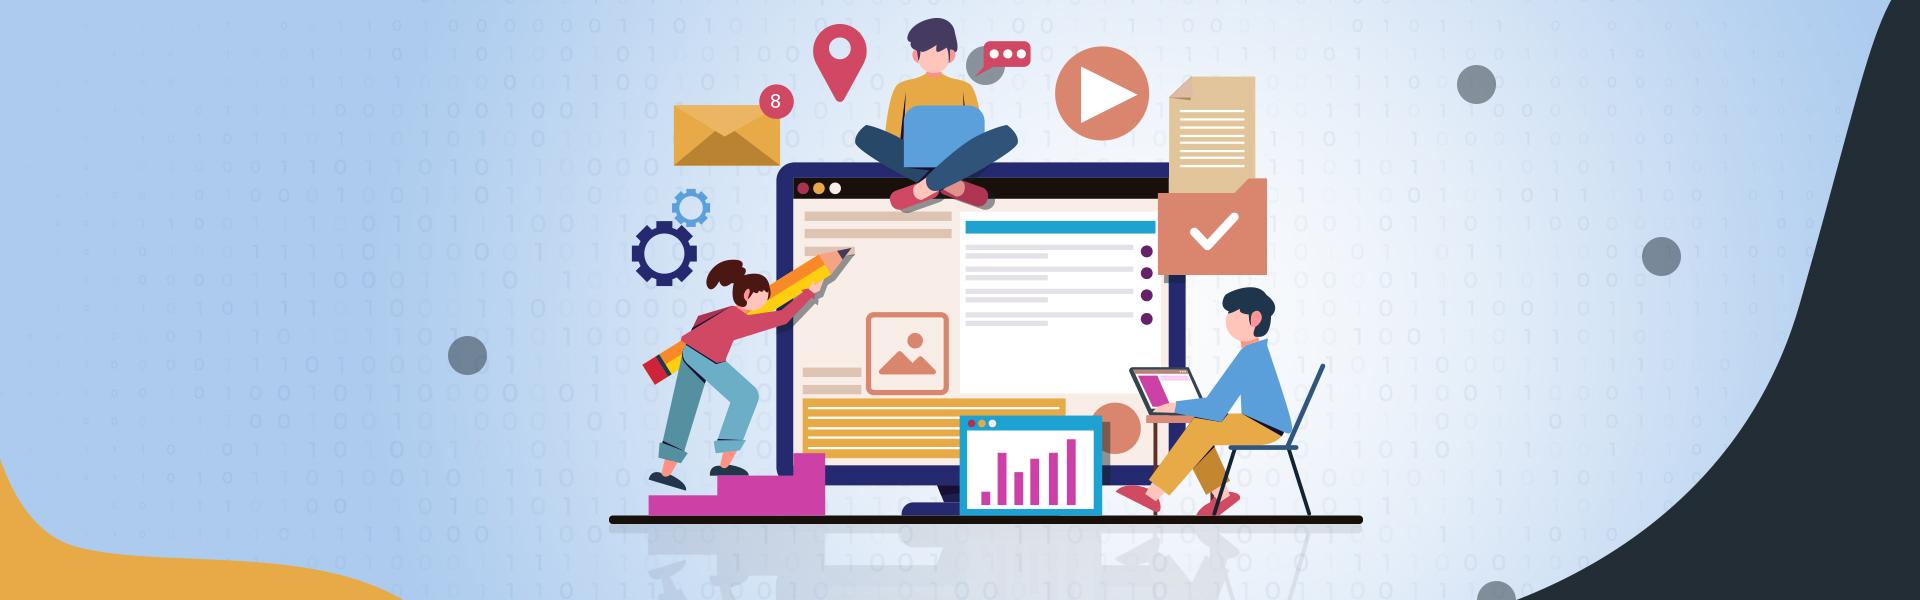 Web Designing and Development Company in Kerala